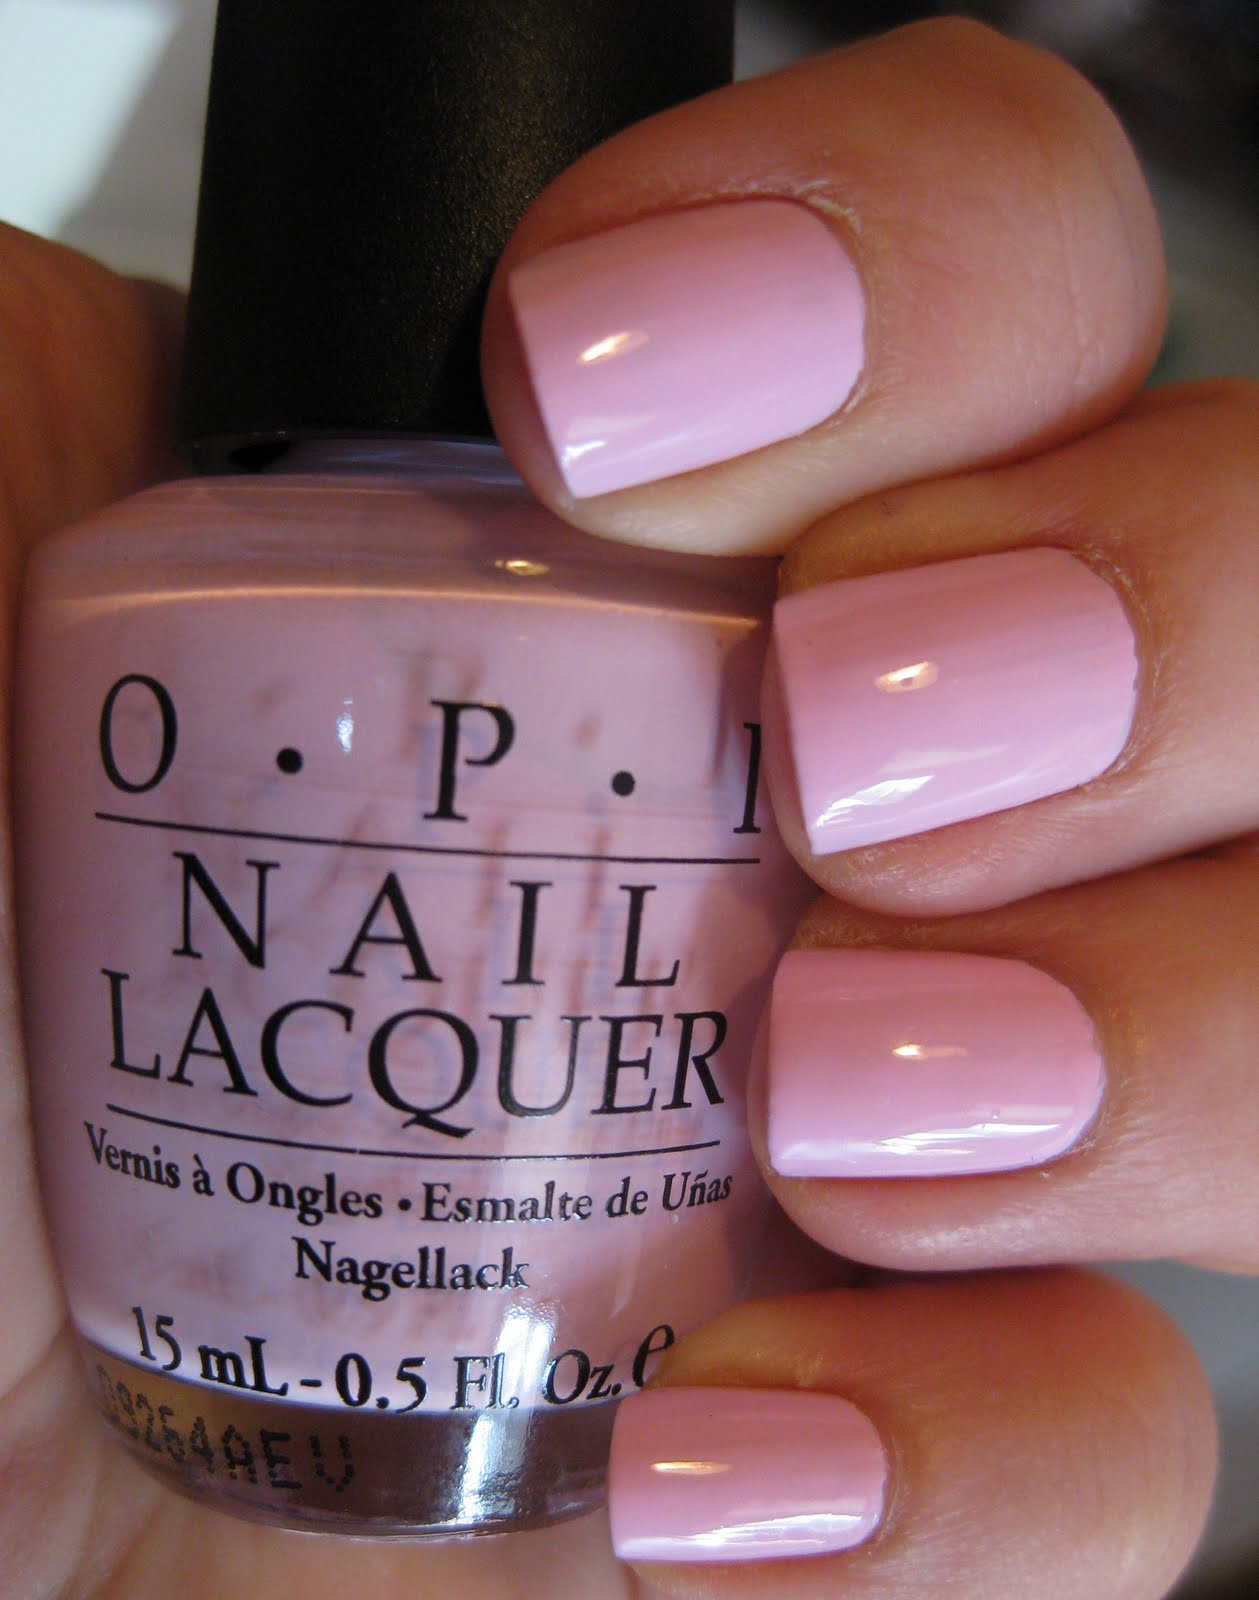 I love this nail polish color - Beauty Insider Community